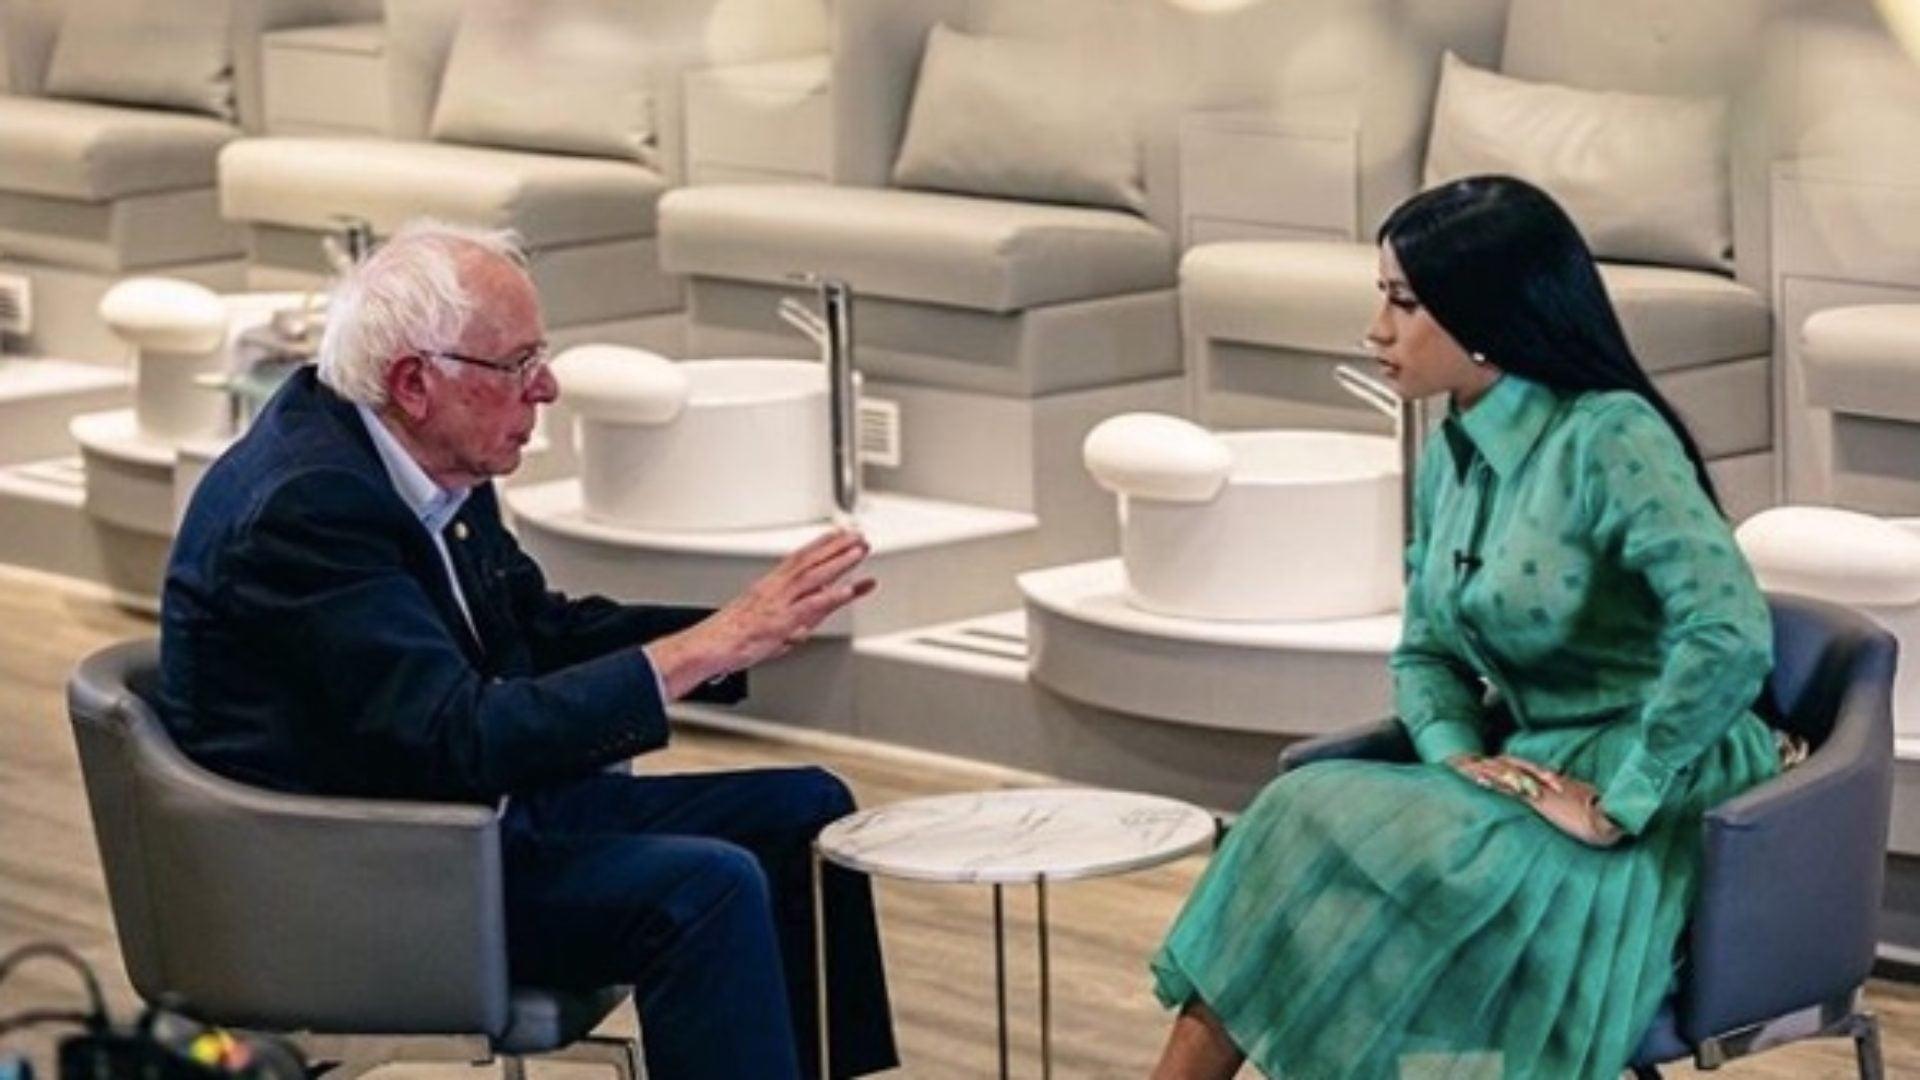 Cardi B Talks Wages And Jobs With Presidential Hopeful Bernie Sanders